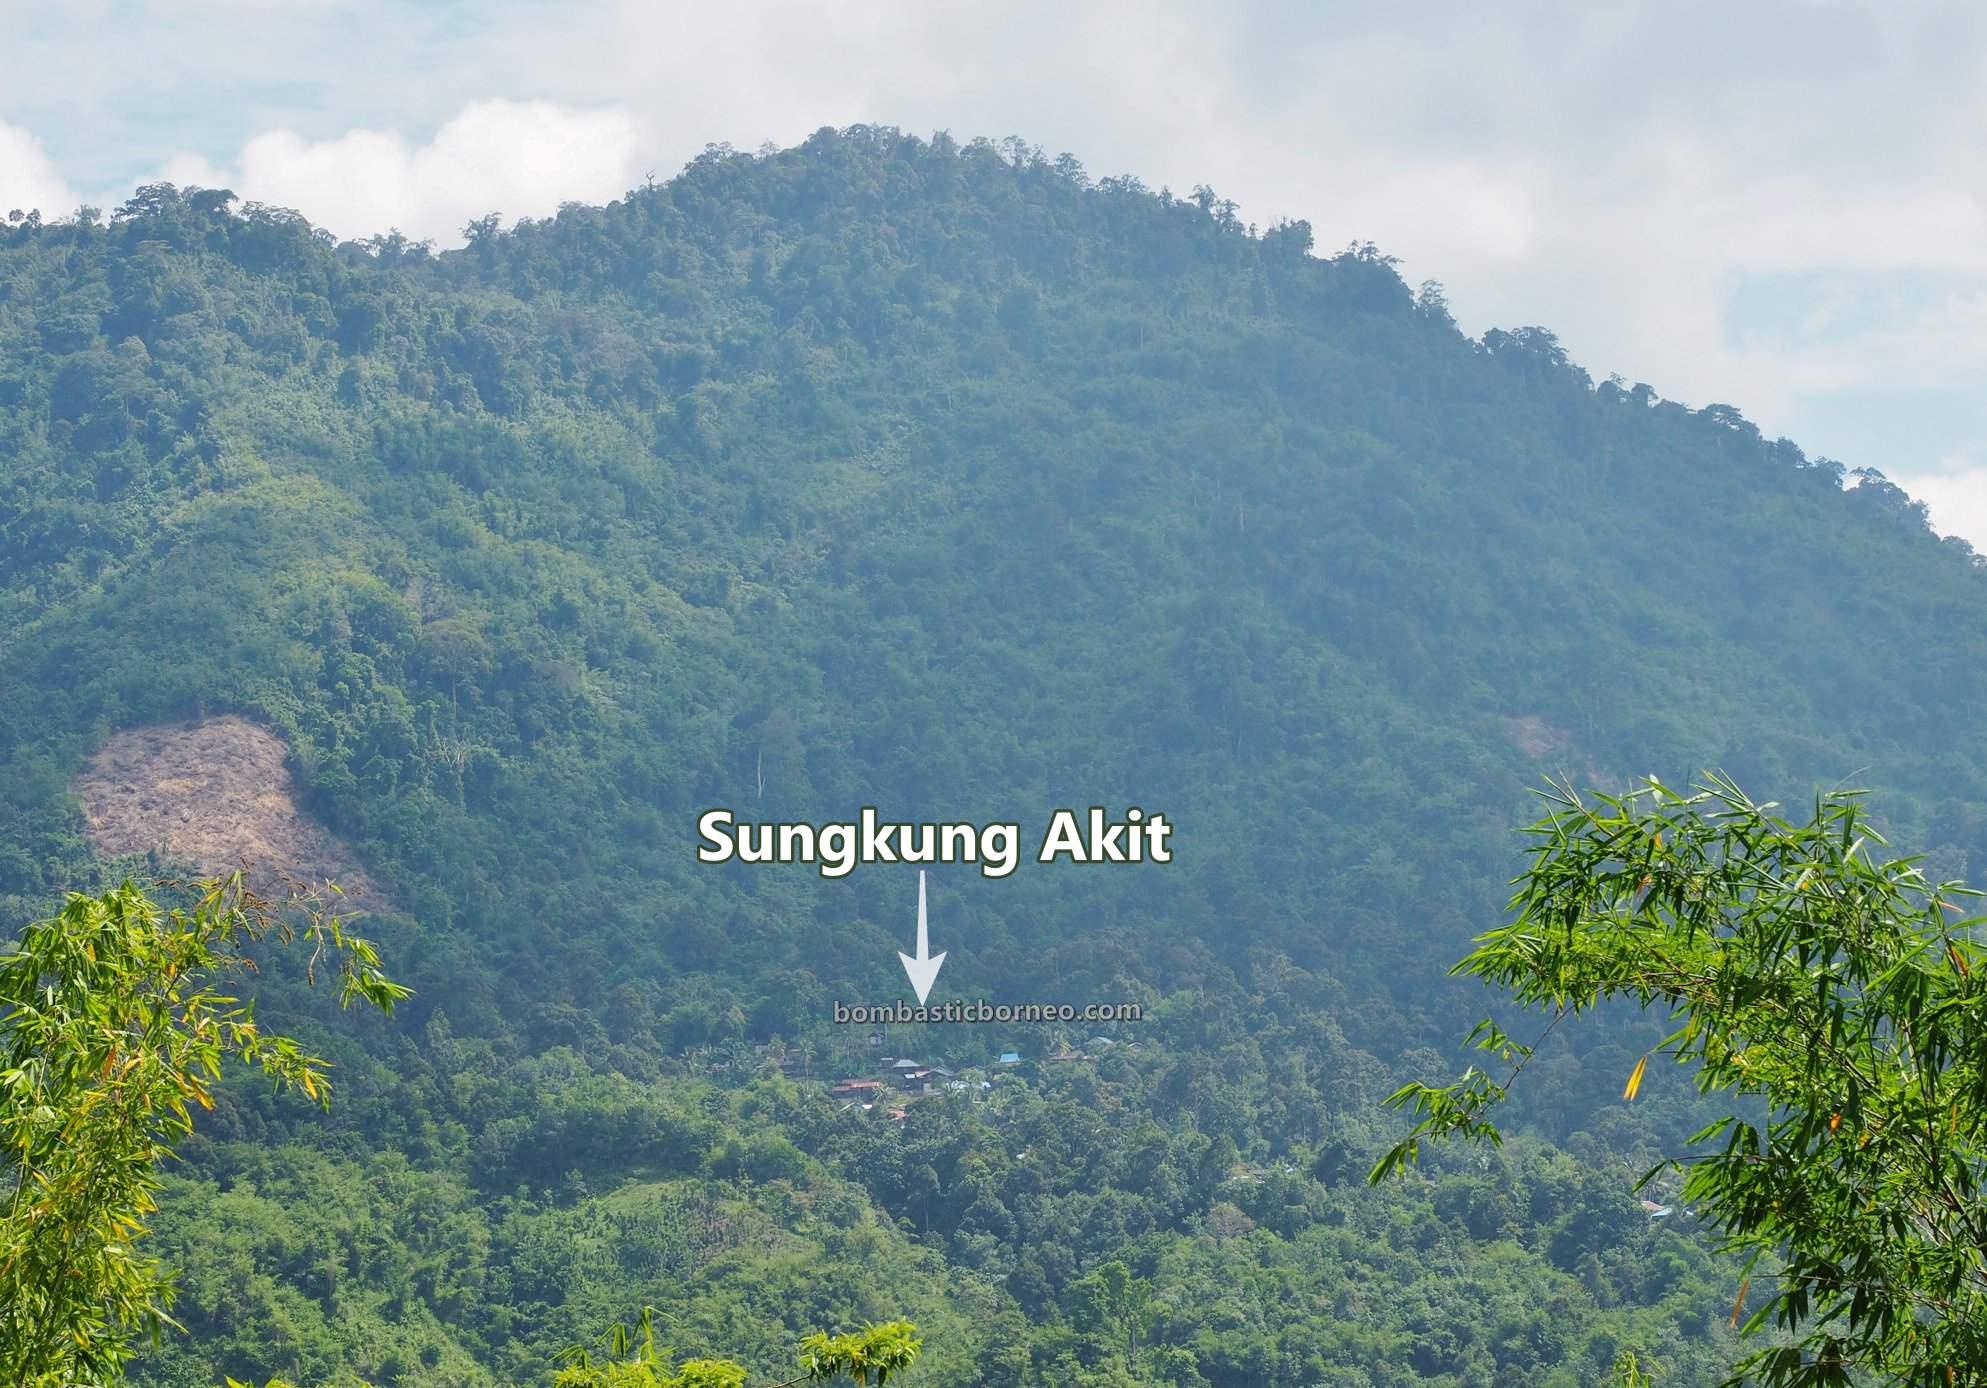 Gunung Sinjang, adventure, motorbike ride, authentic, traditional, exploration, native, Highland, Village, Tourism, travel guide, Cross Border, Borneo, 印尼西加里曼丹, 孟加映原住民部落,